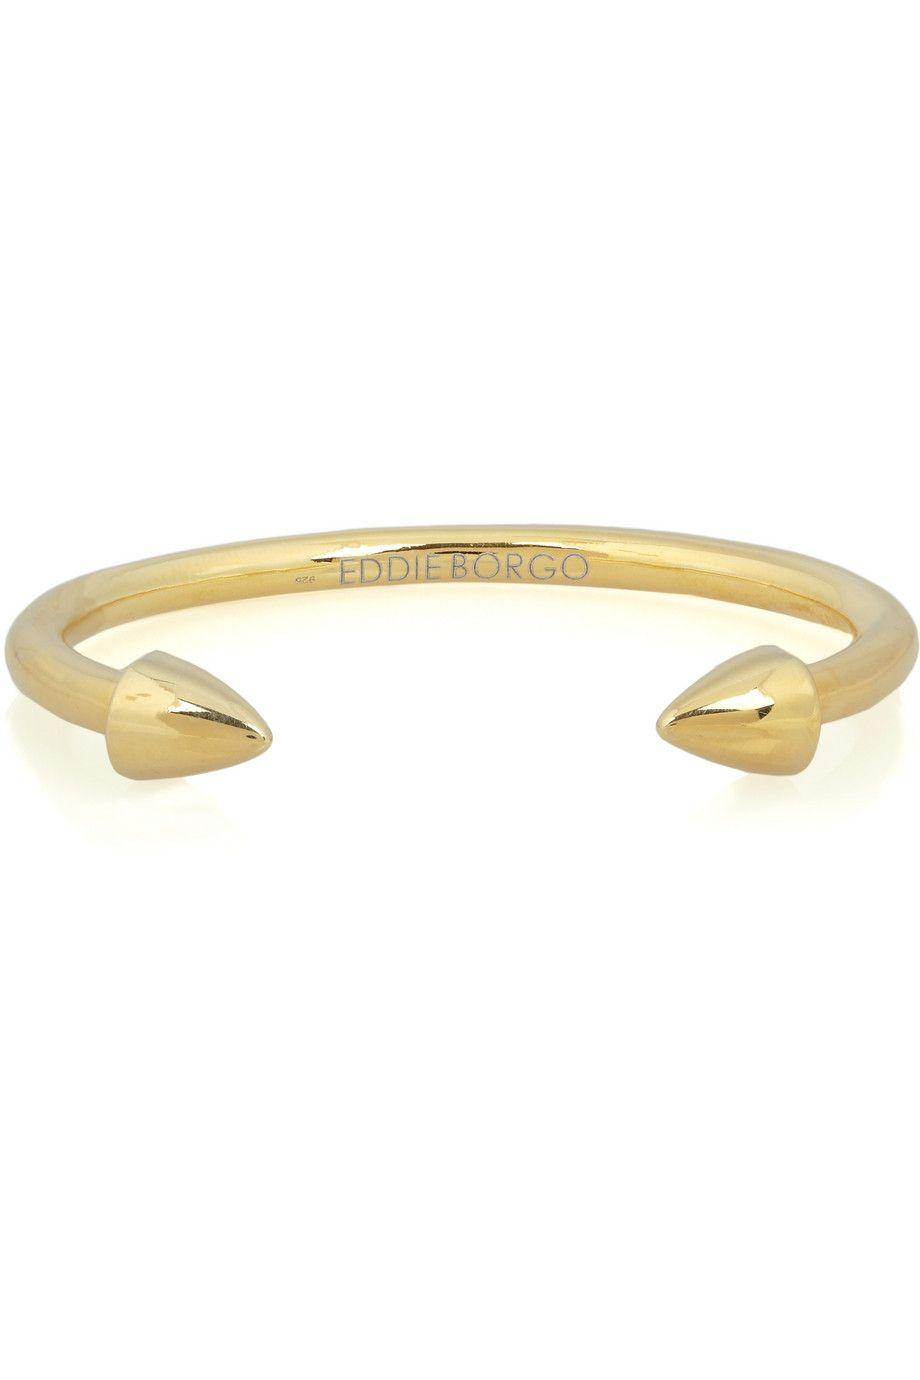 Eddie Borgo 24karat goldplated silver cone cuff NETAPORTER